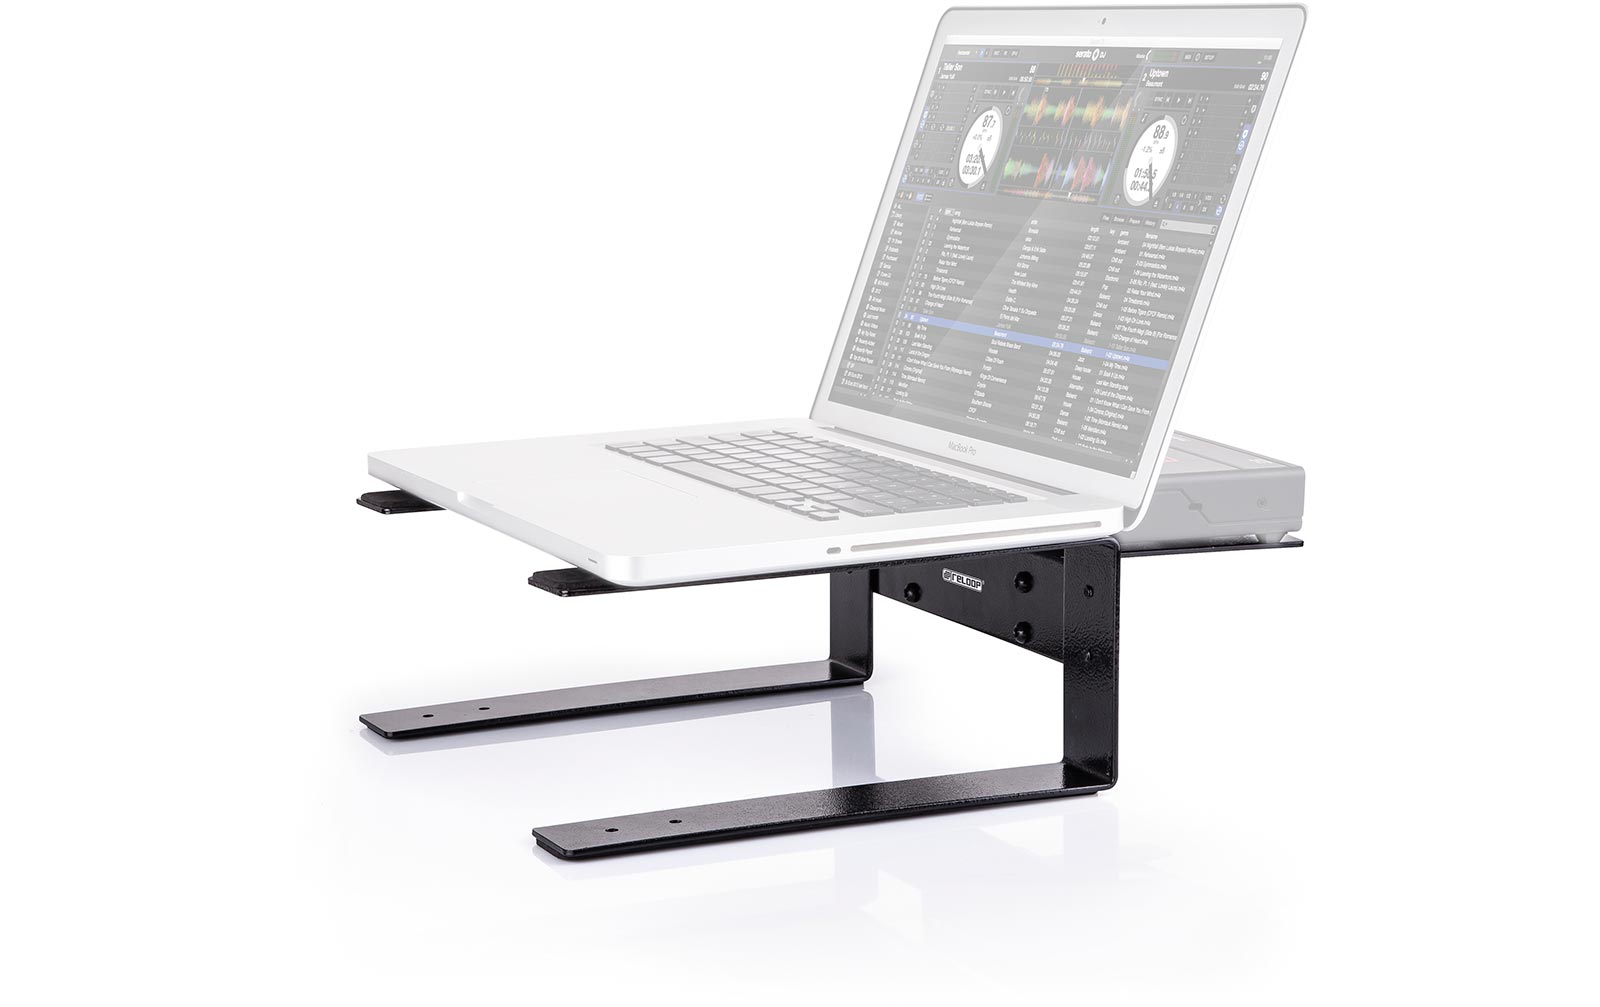 reloop laptop stand flat g nstig online kaufen im music and more store. Black Bedroom Furniture Sets. Home Design Ideas